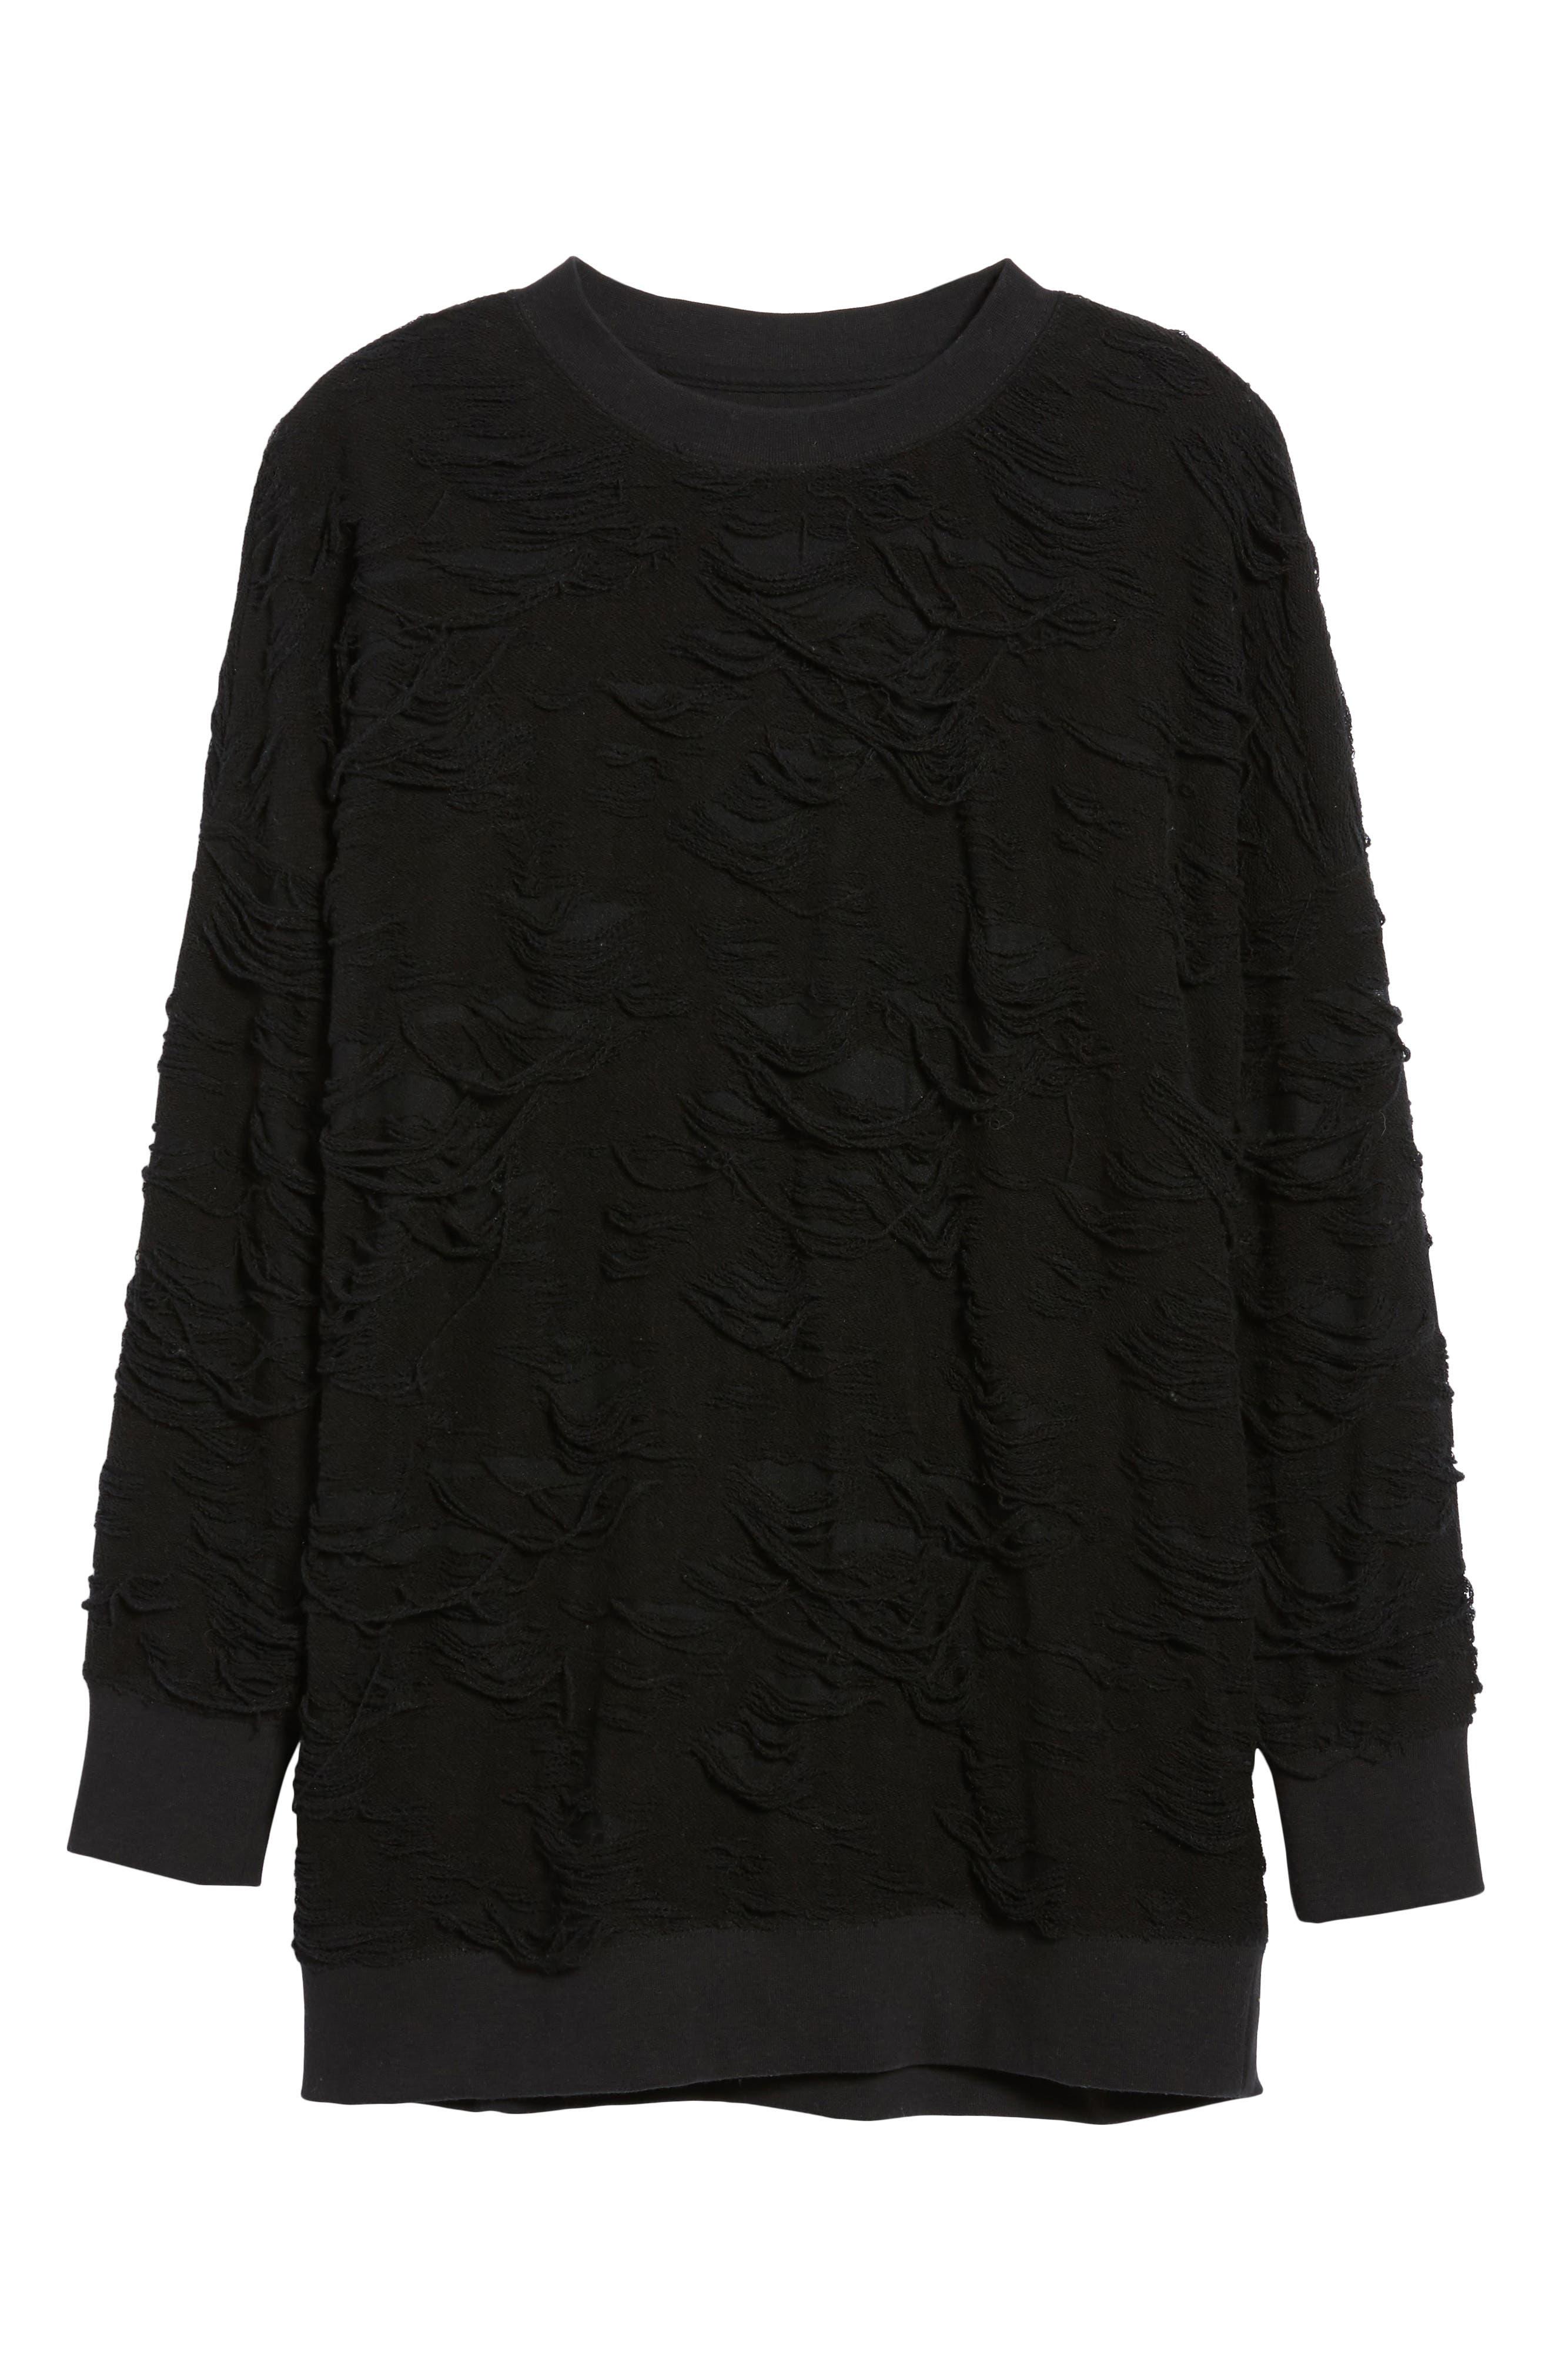 Me Too Slashed Sweatshirt,                             Alternate thumbnail 6, color,                             Black